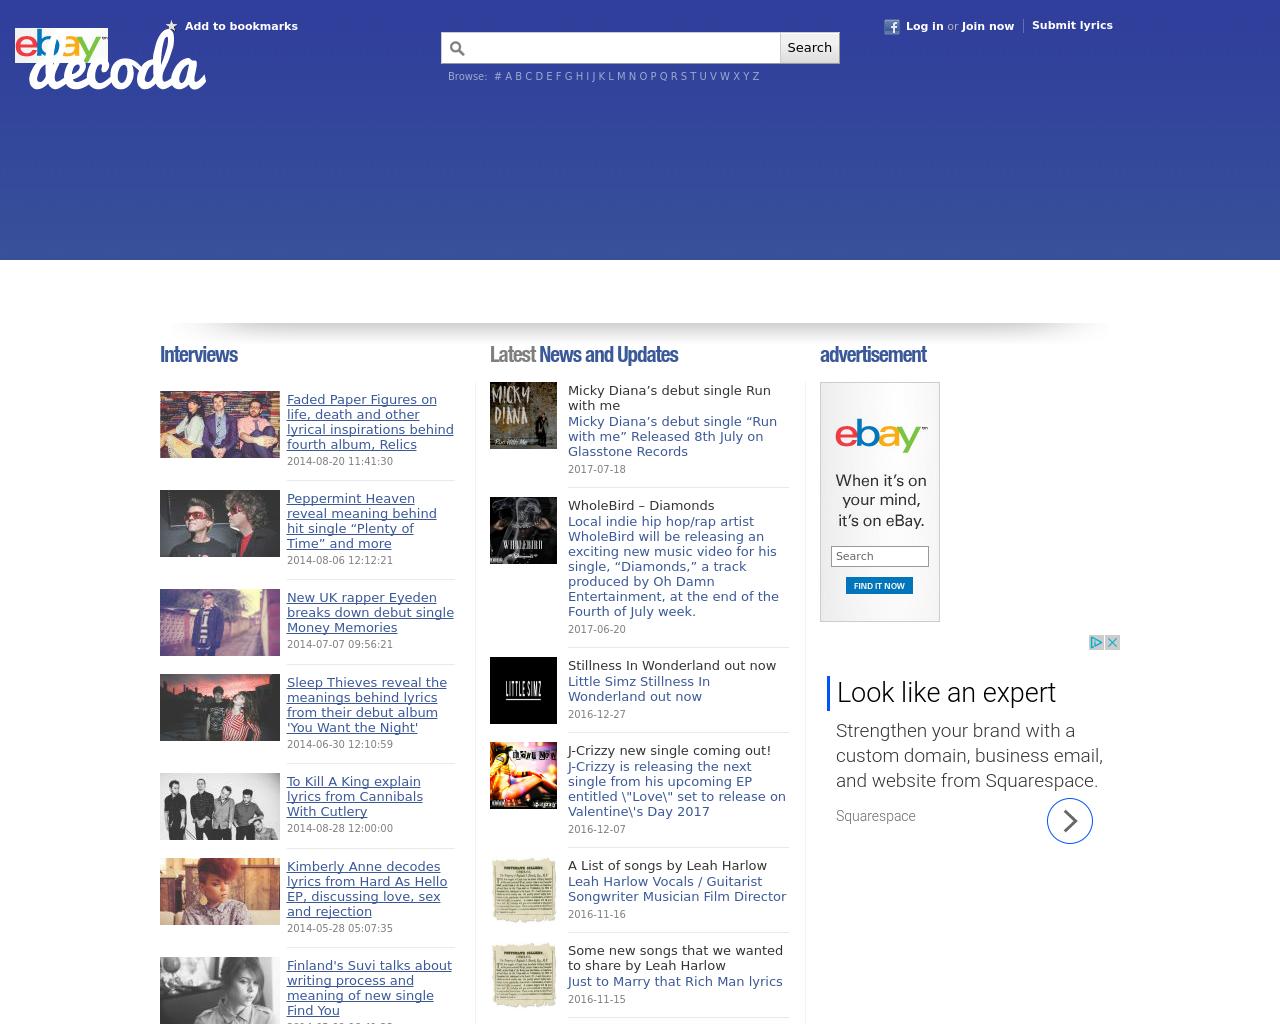 Decoda-Advertising-Reviews-Pricing